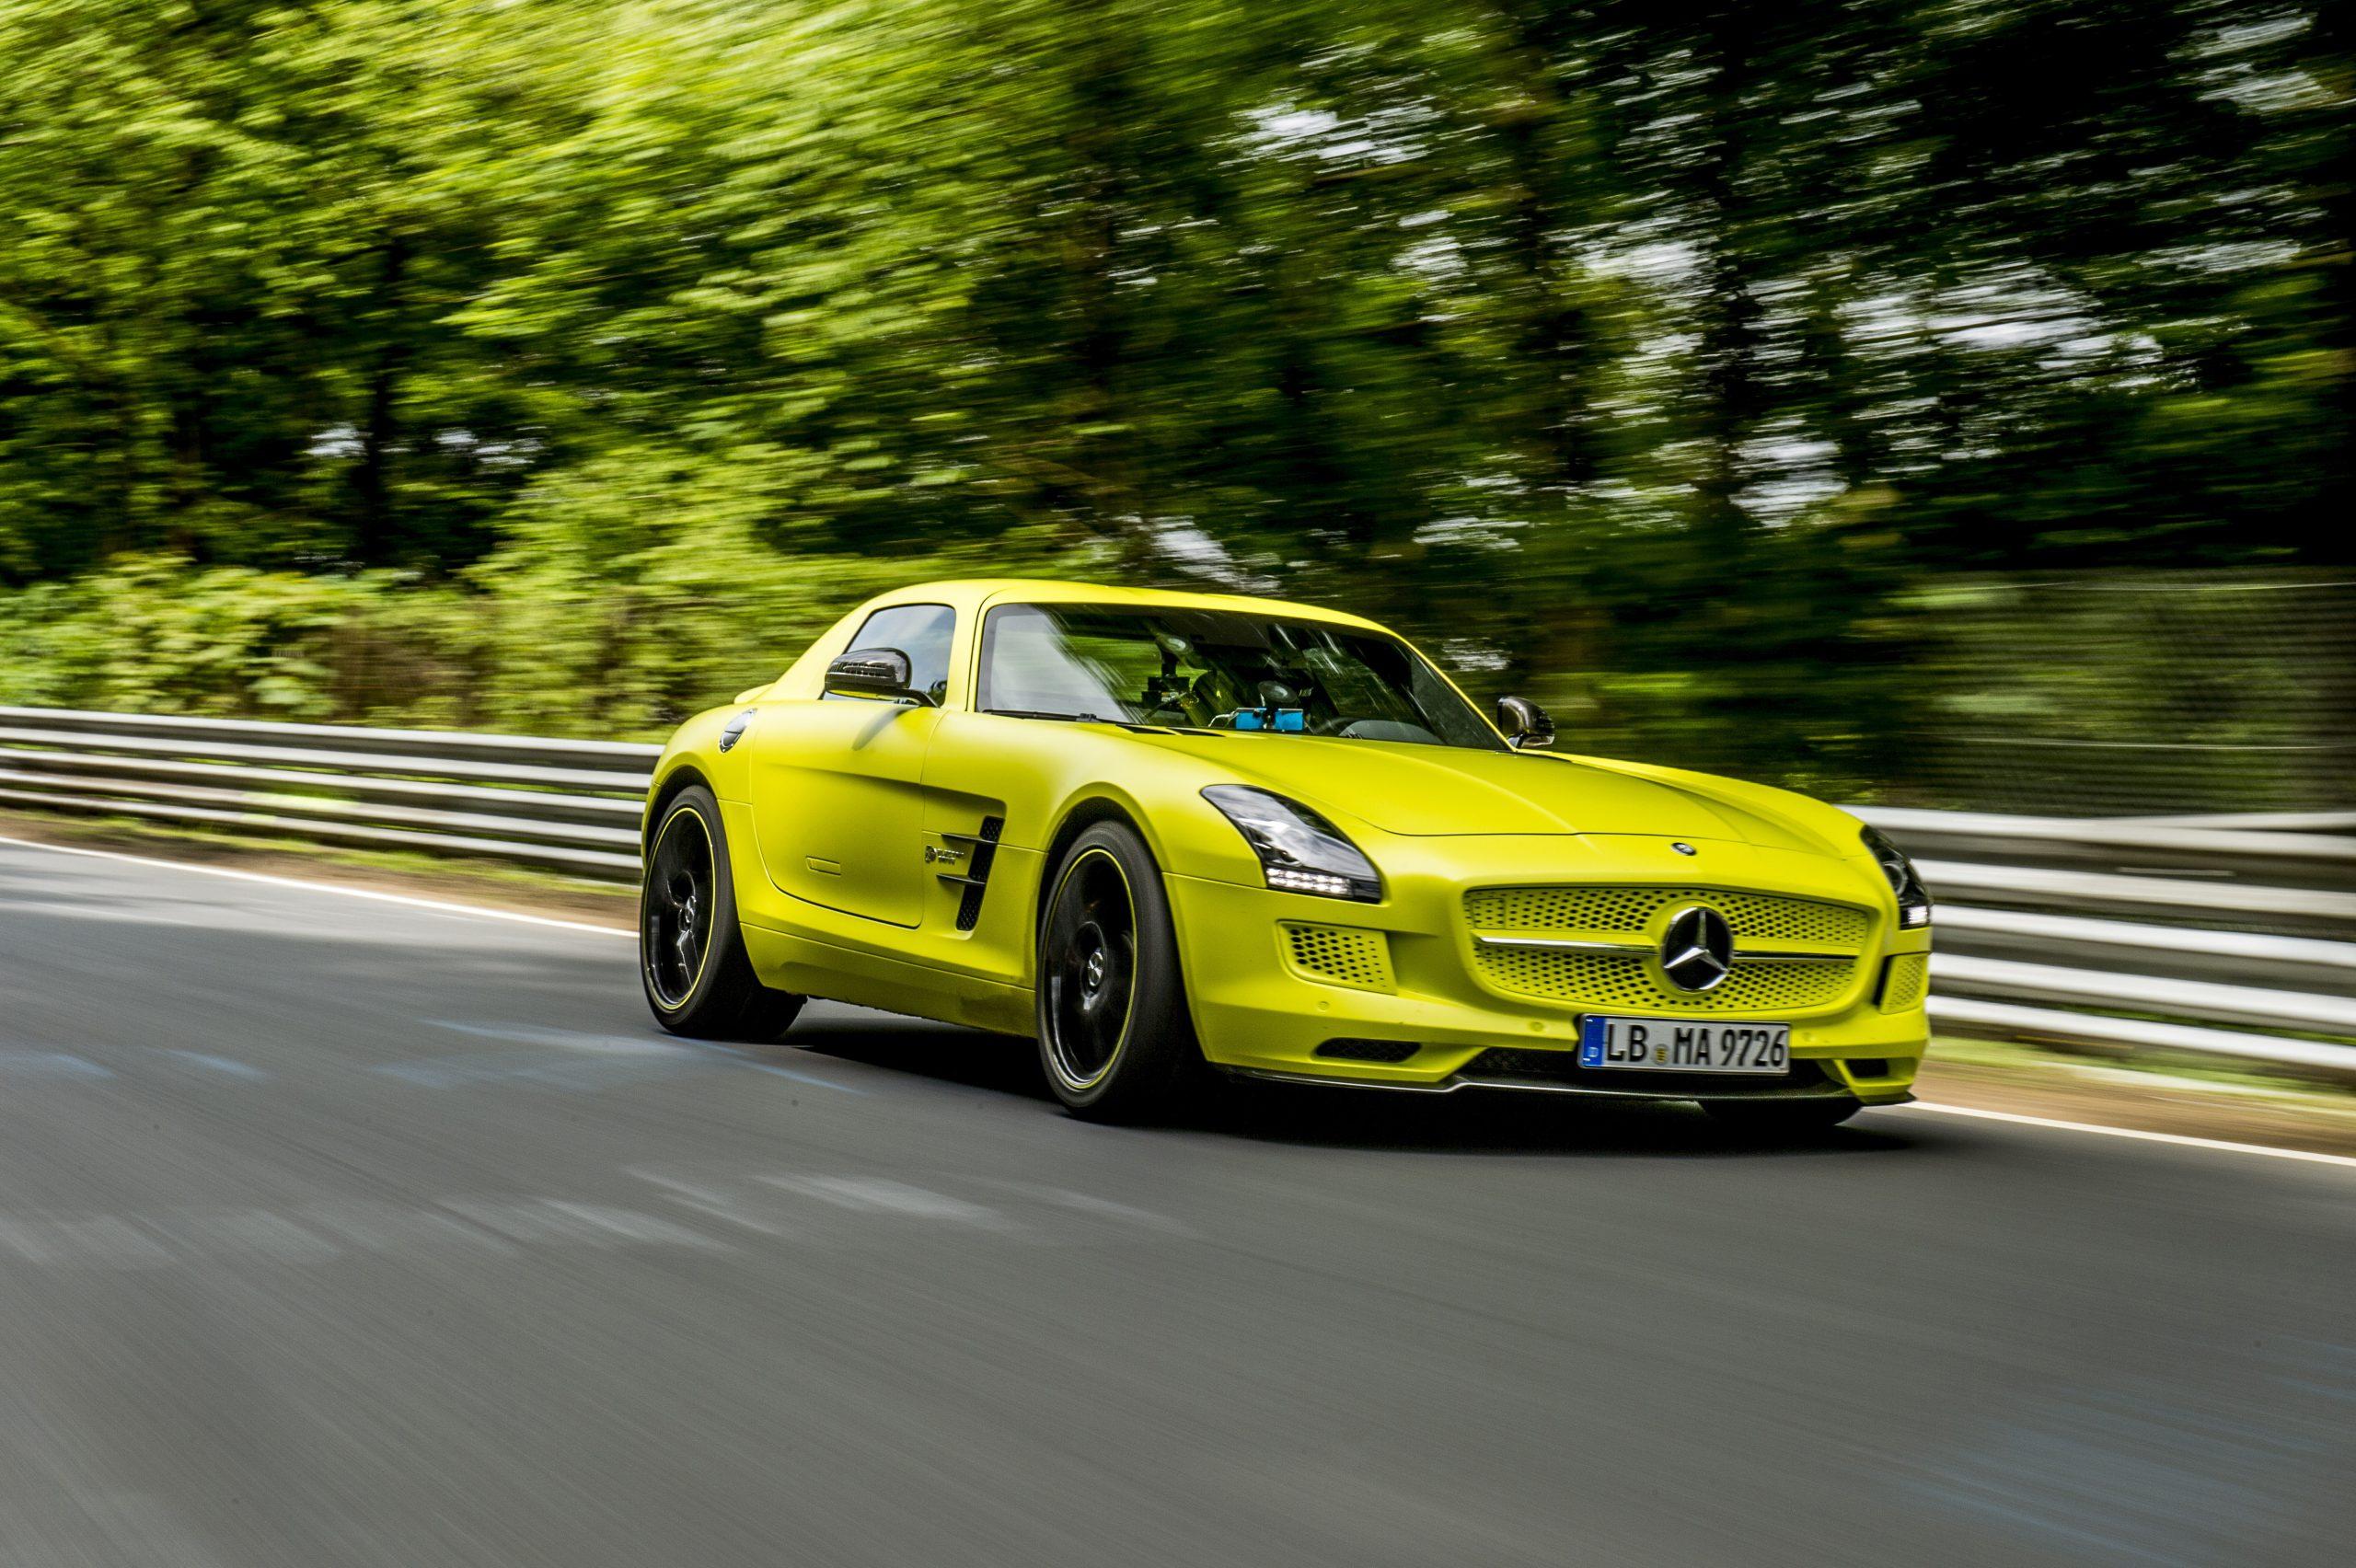 Mercedes-Benz SLS AMG Coupé Electric Drive Nurburgring 2013